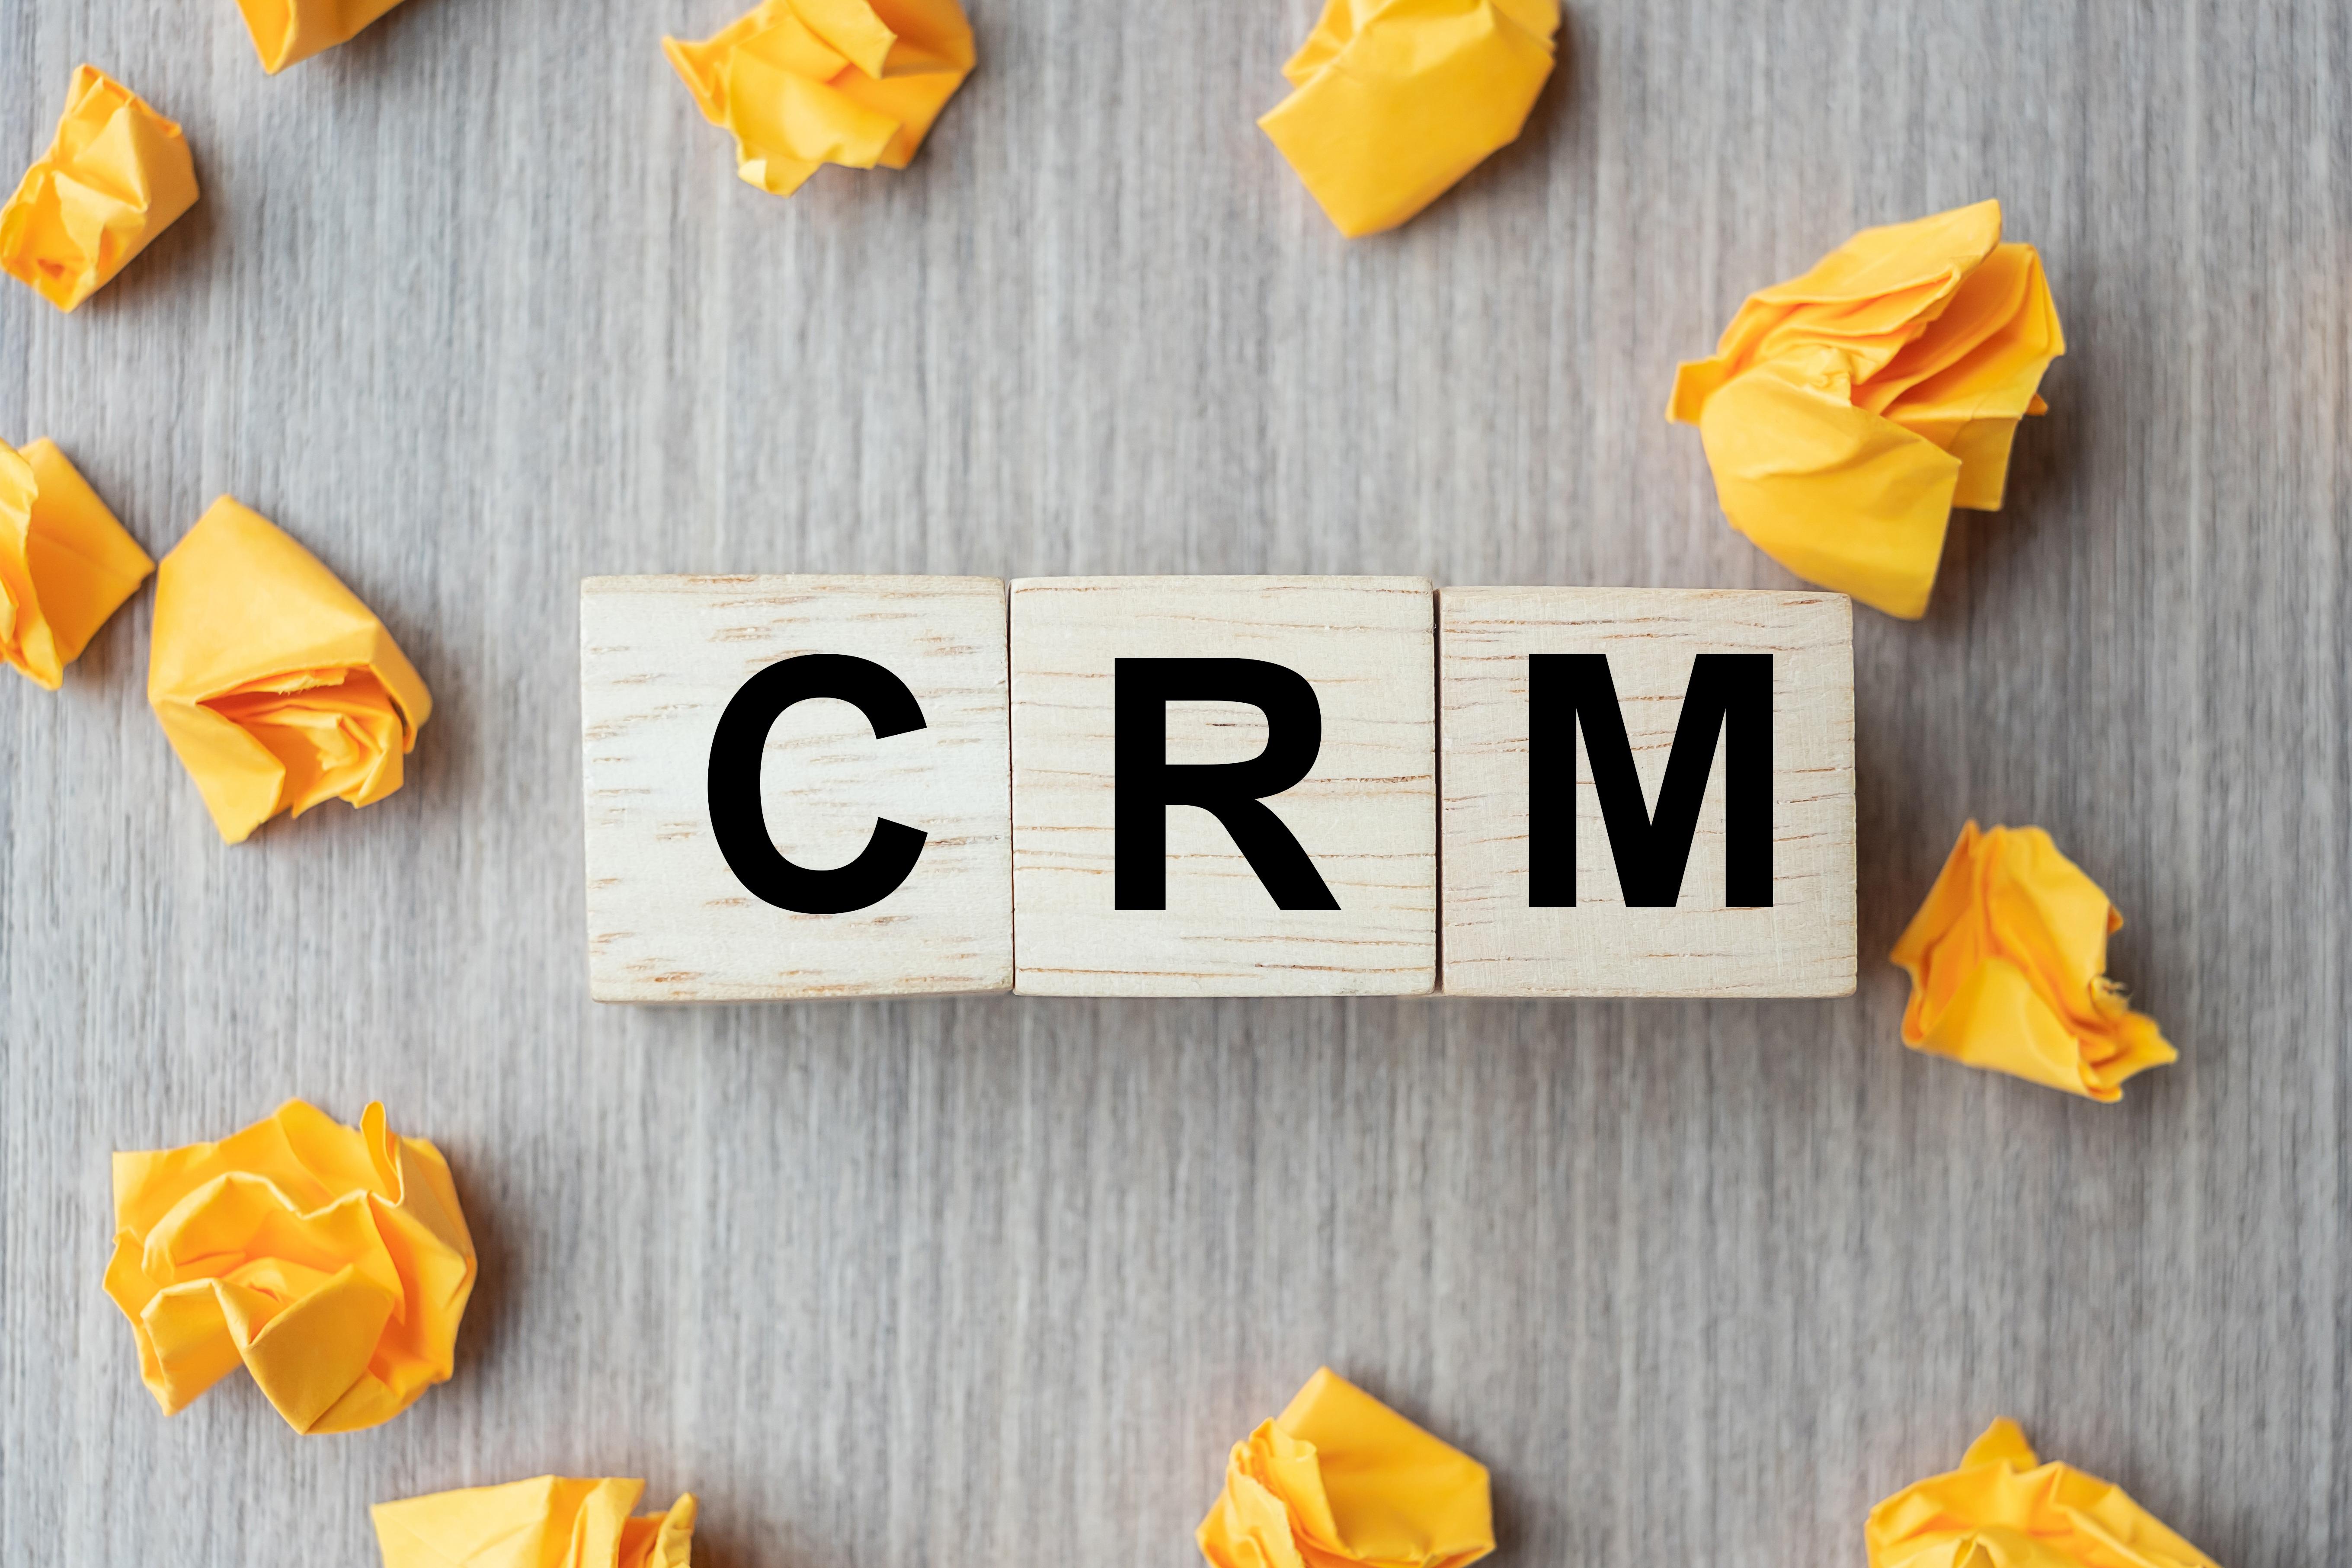 Mojo as CRM